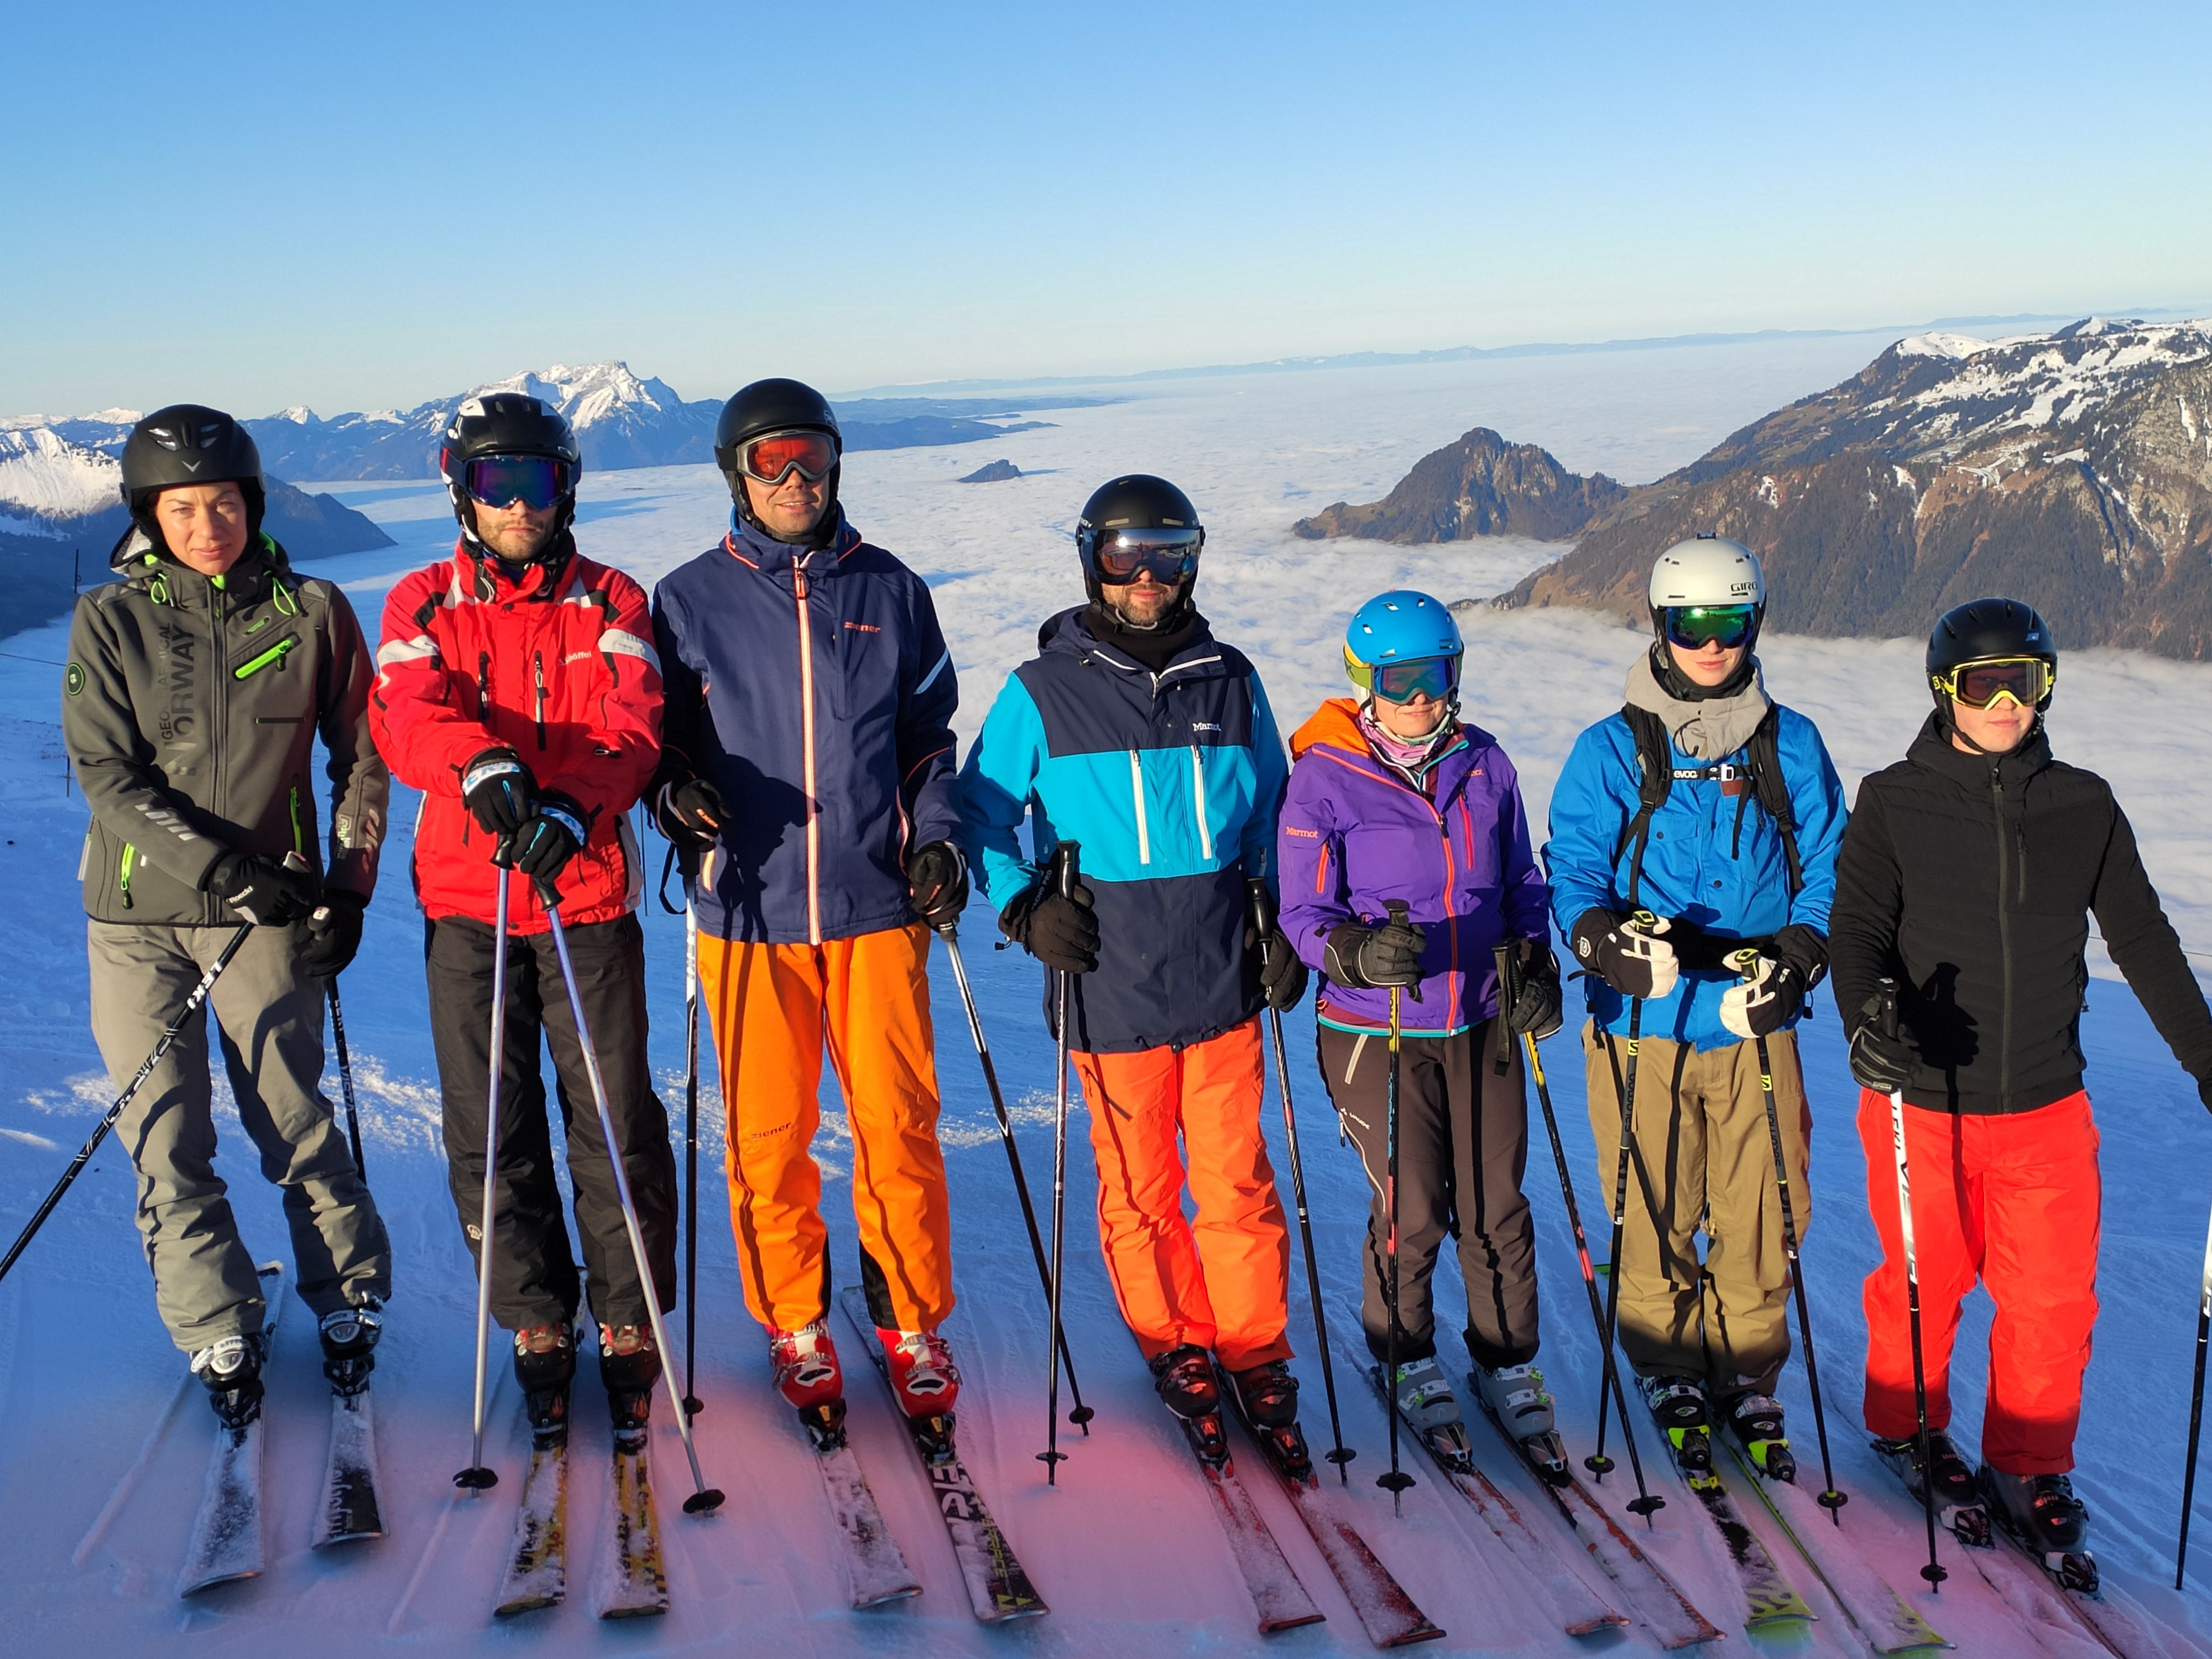 Familien Ski-Freizeit